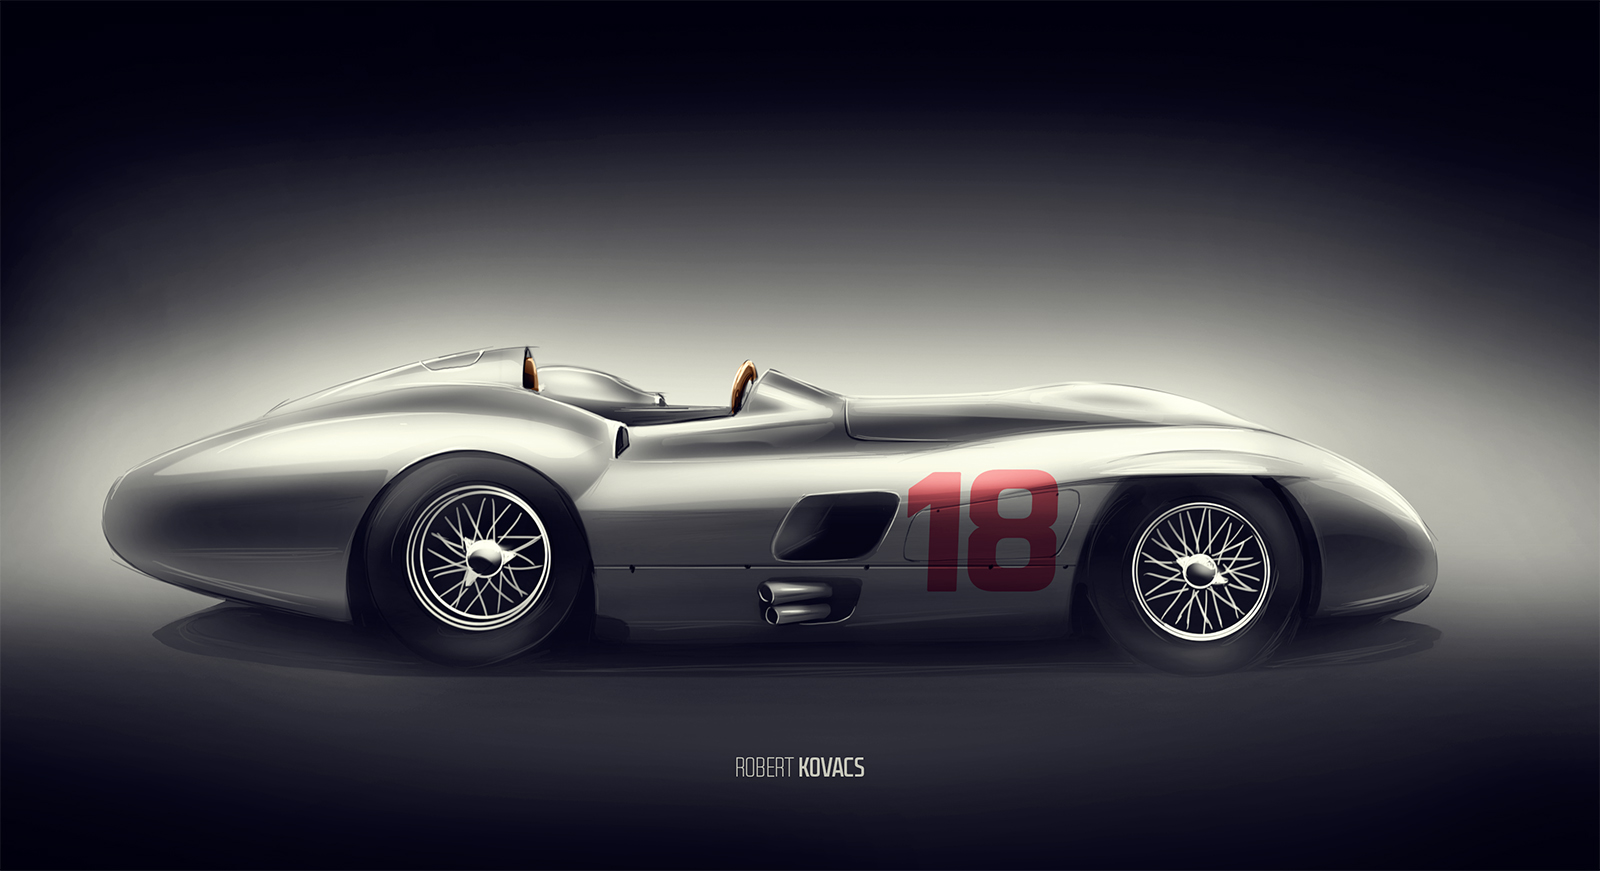 Mercedes benz 300 slr by roobi on deviantart for Mercedes benz 300 slr